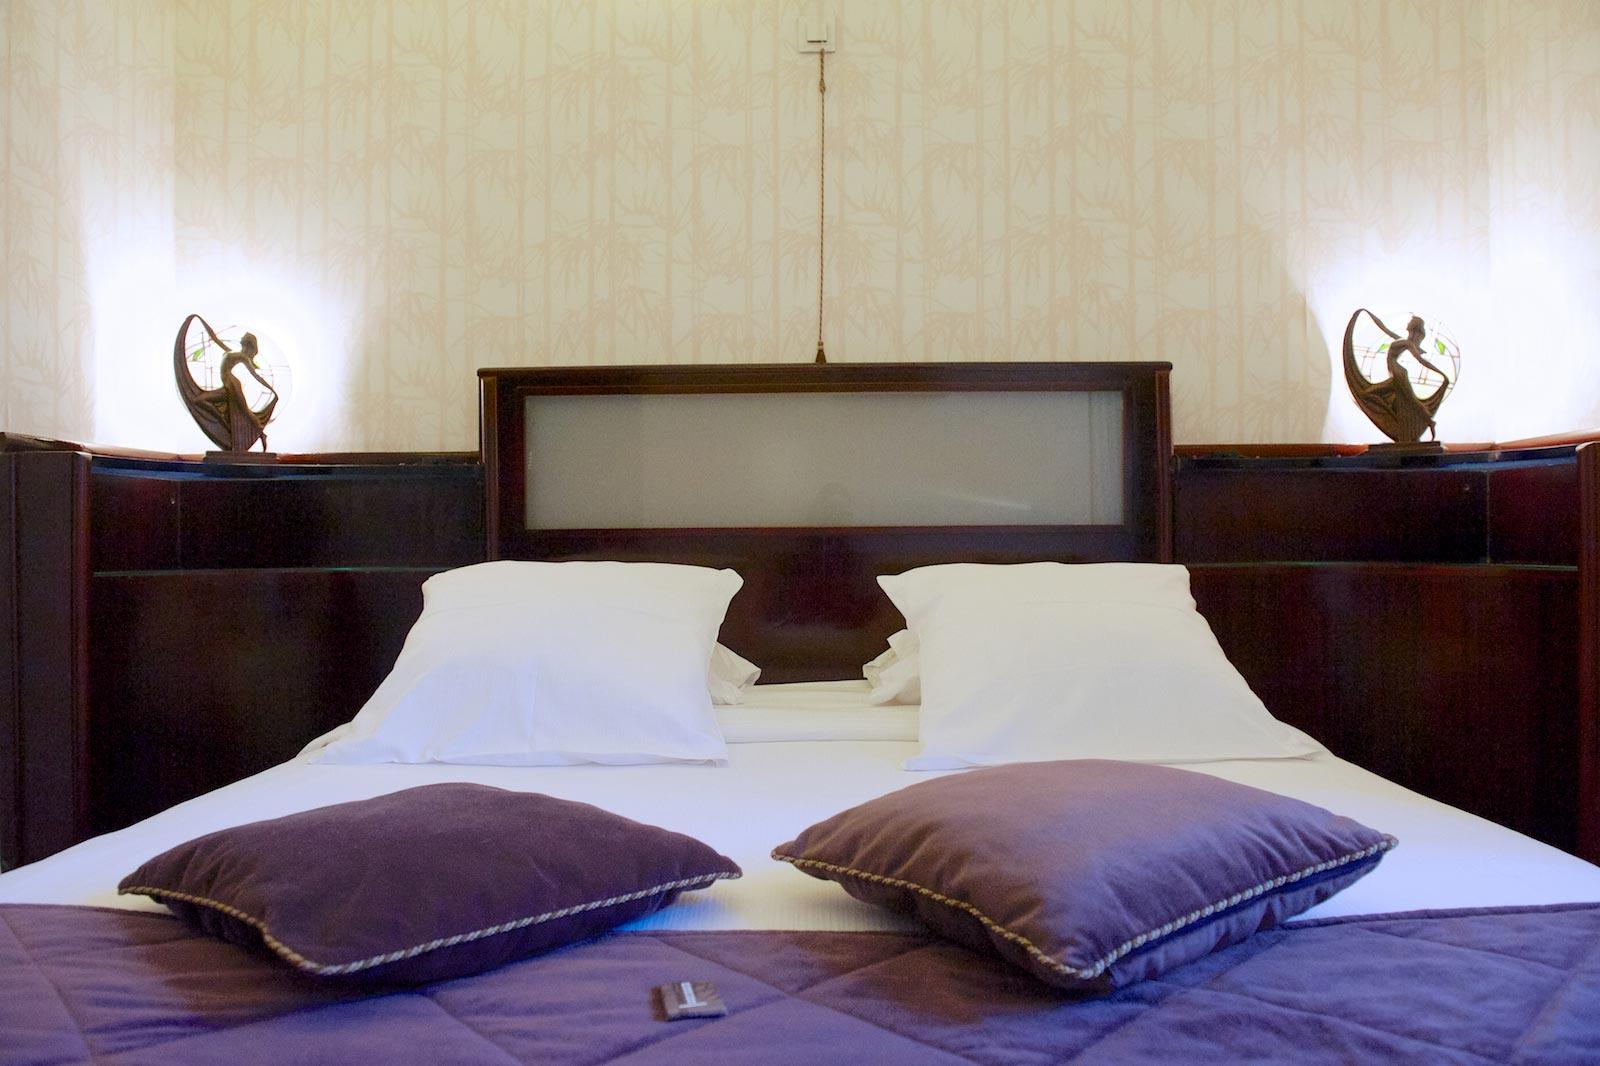 hotel-le-berger-rooms-superieur-jeanne-10-04.jpg